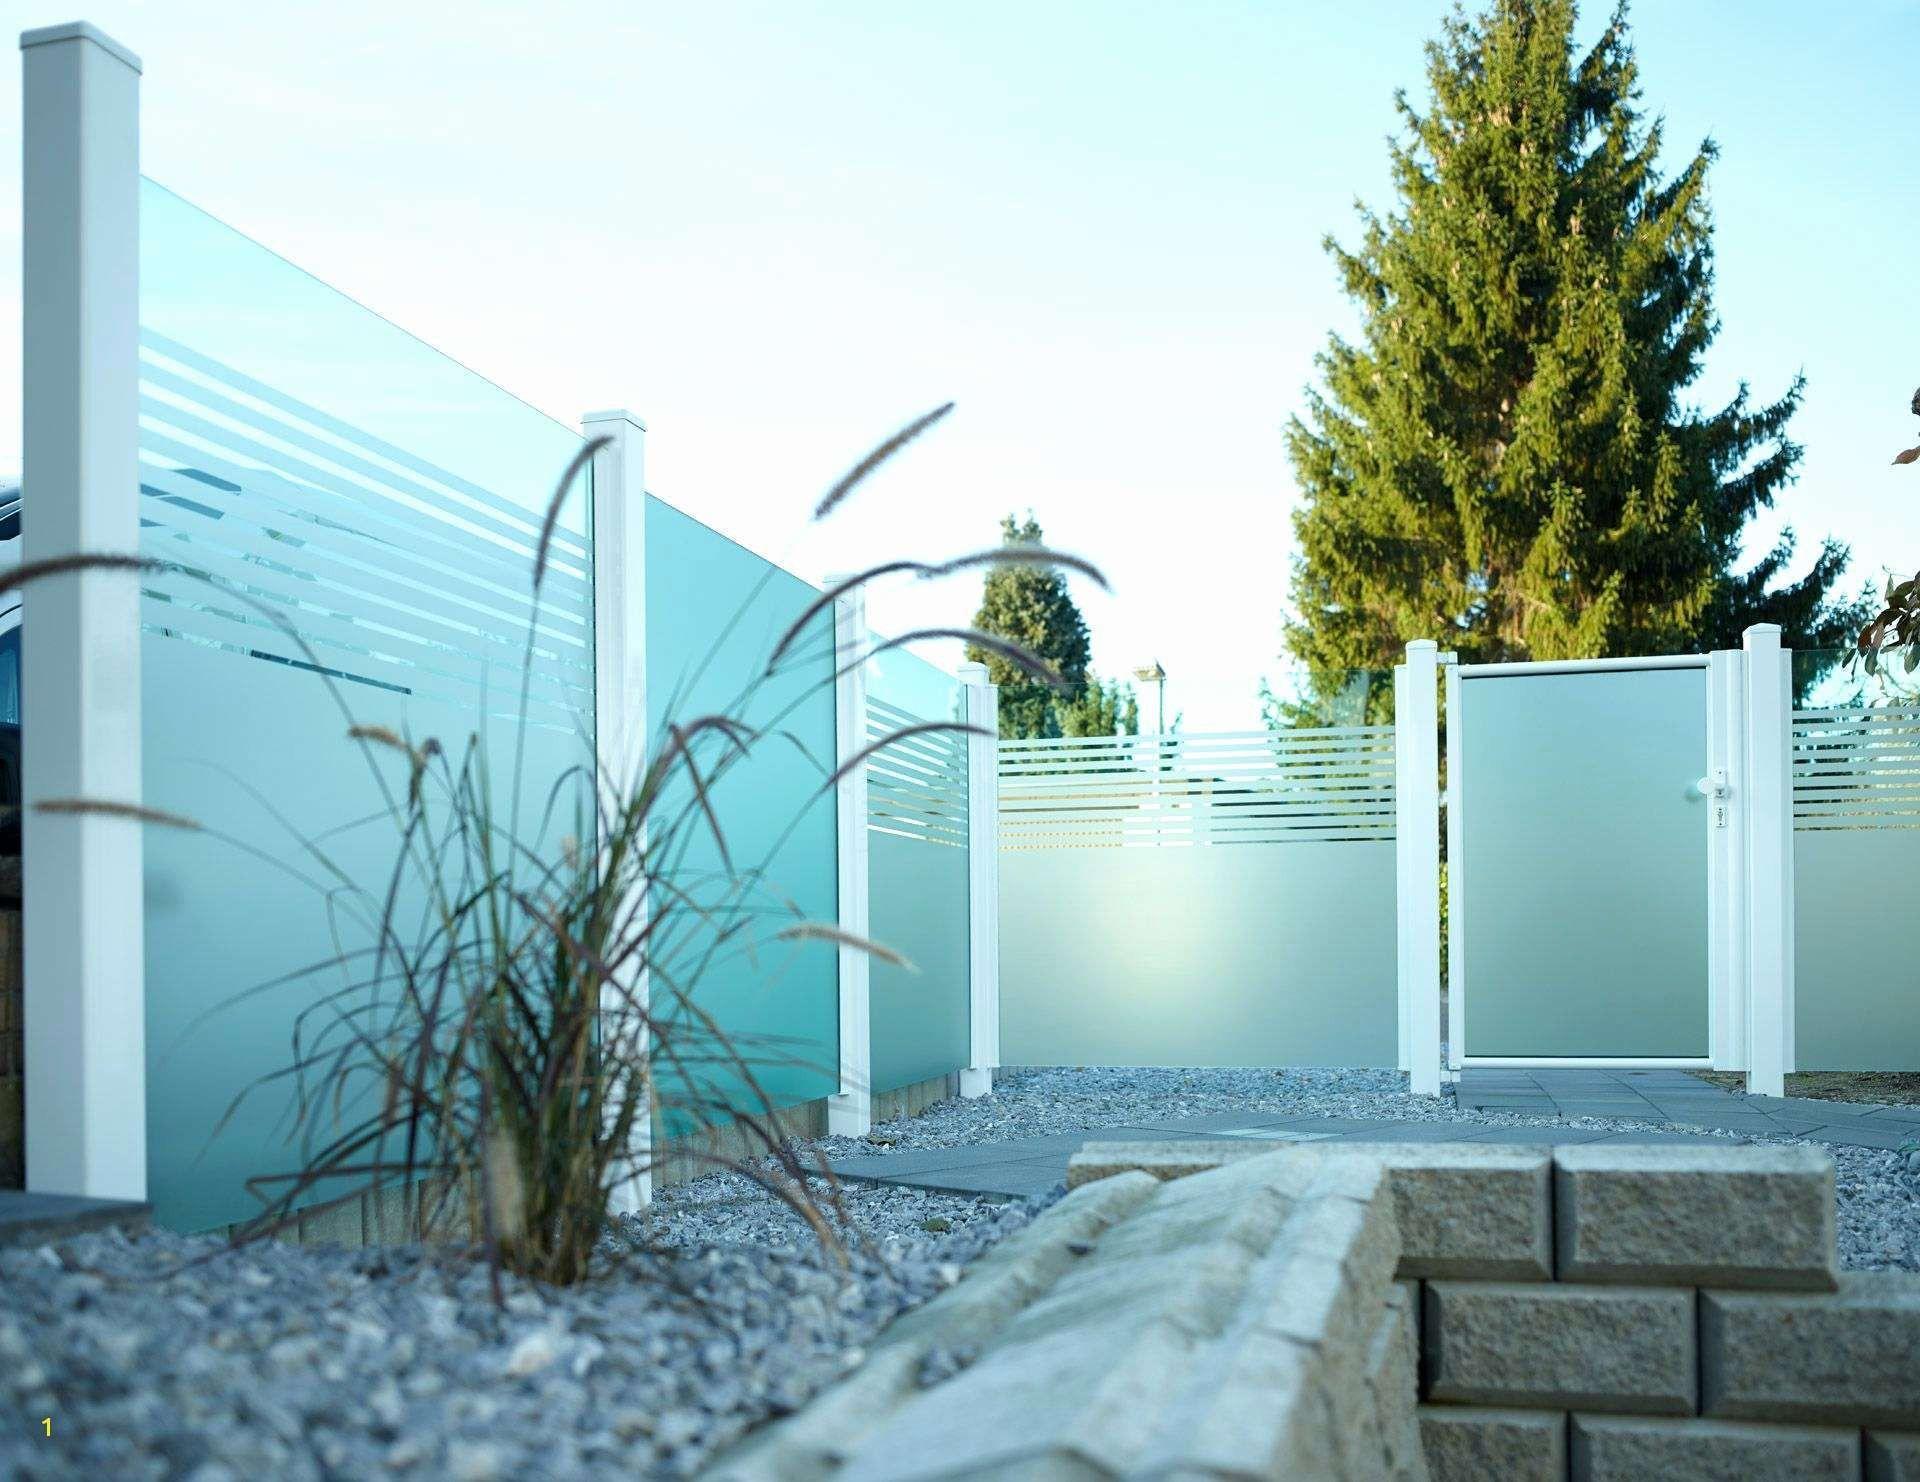 Frisch 40 Zum Sichtschutz Fur Maschendrahtzaun Glaszaun